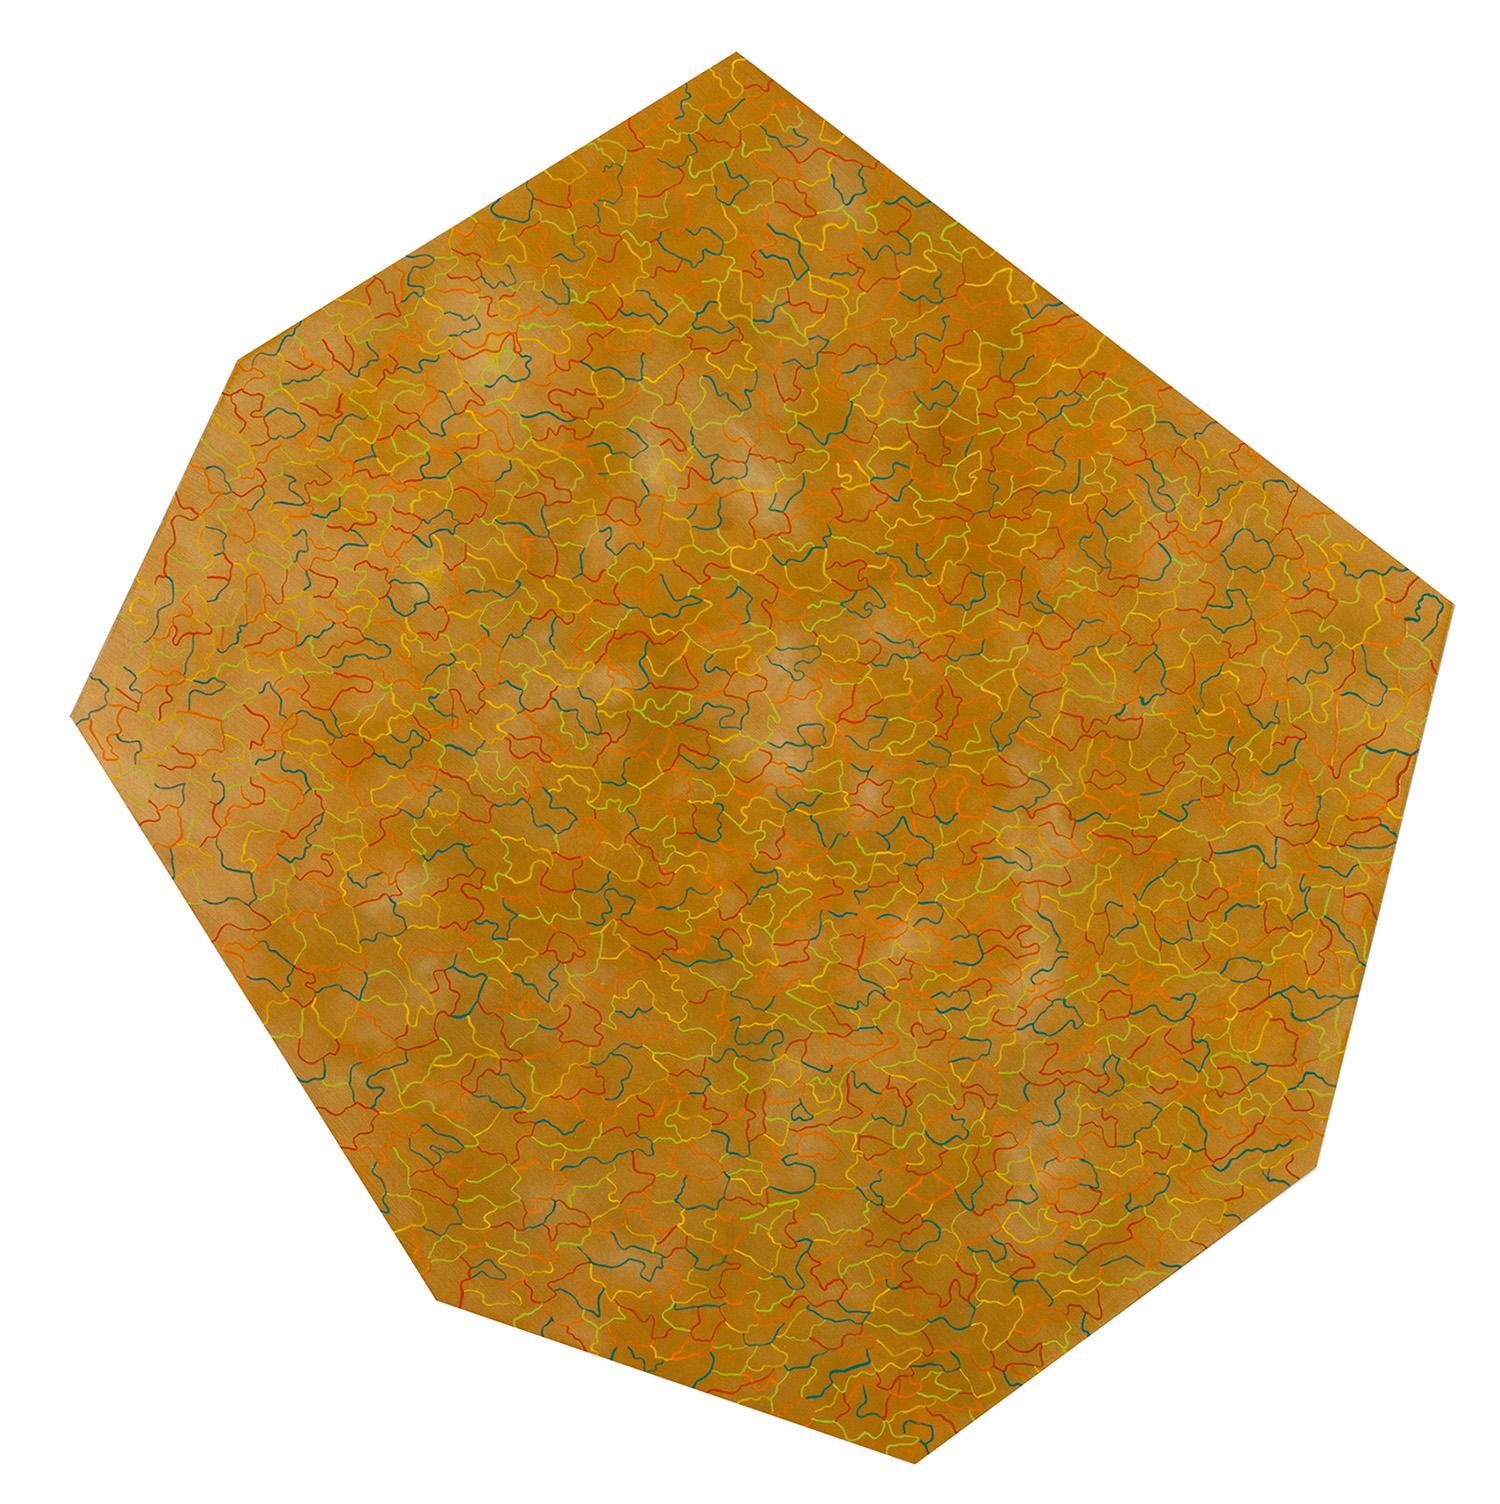 Helga Groves, Optical Terrane # 2, 2015